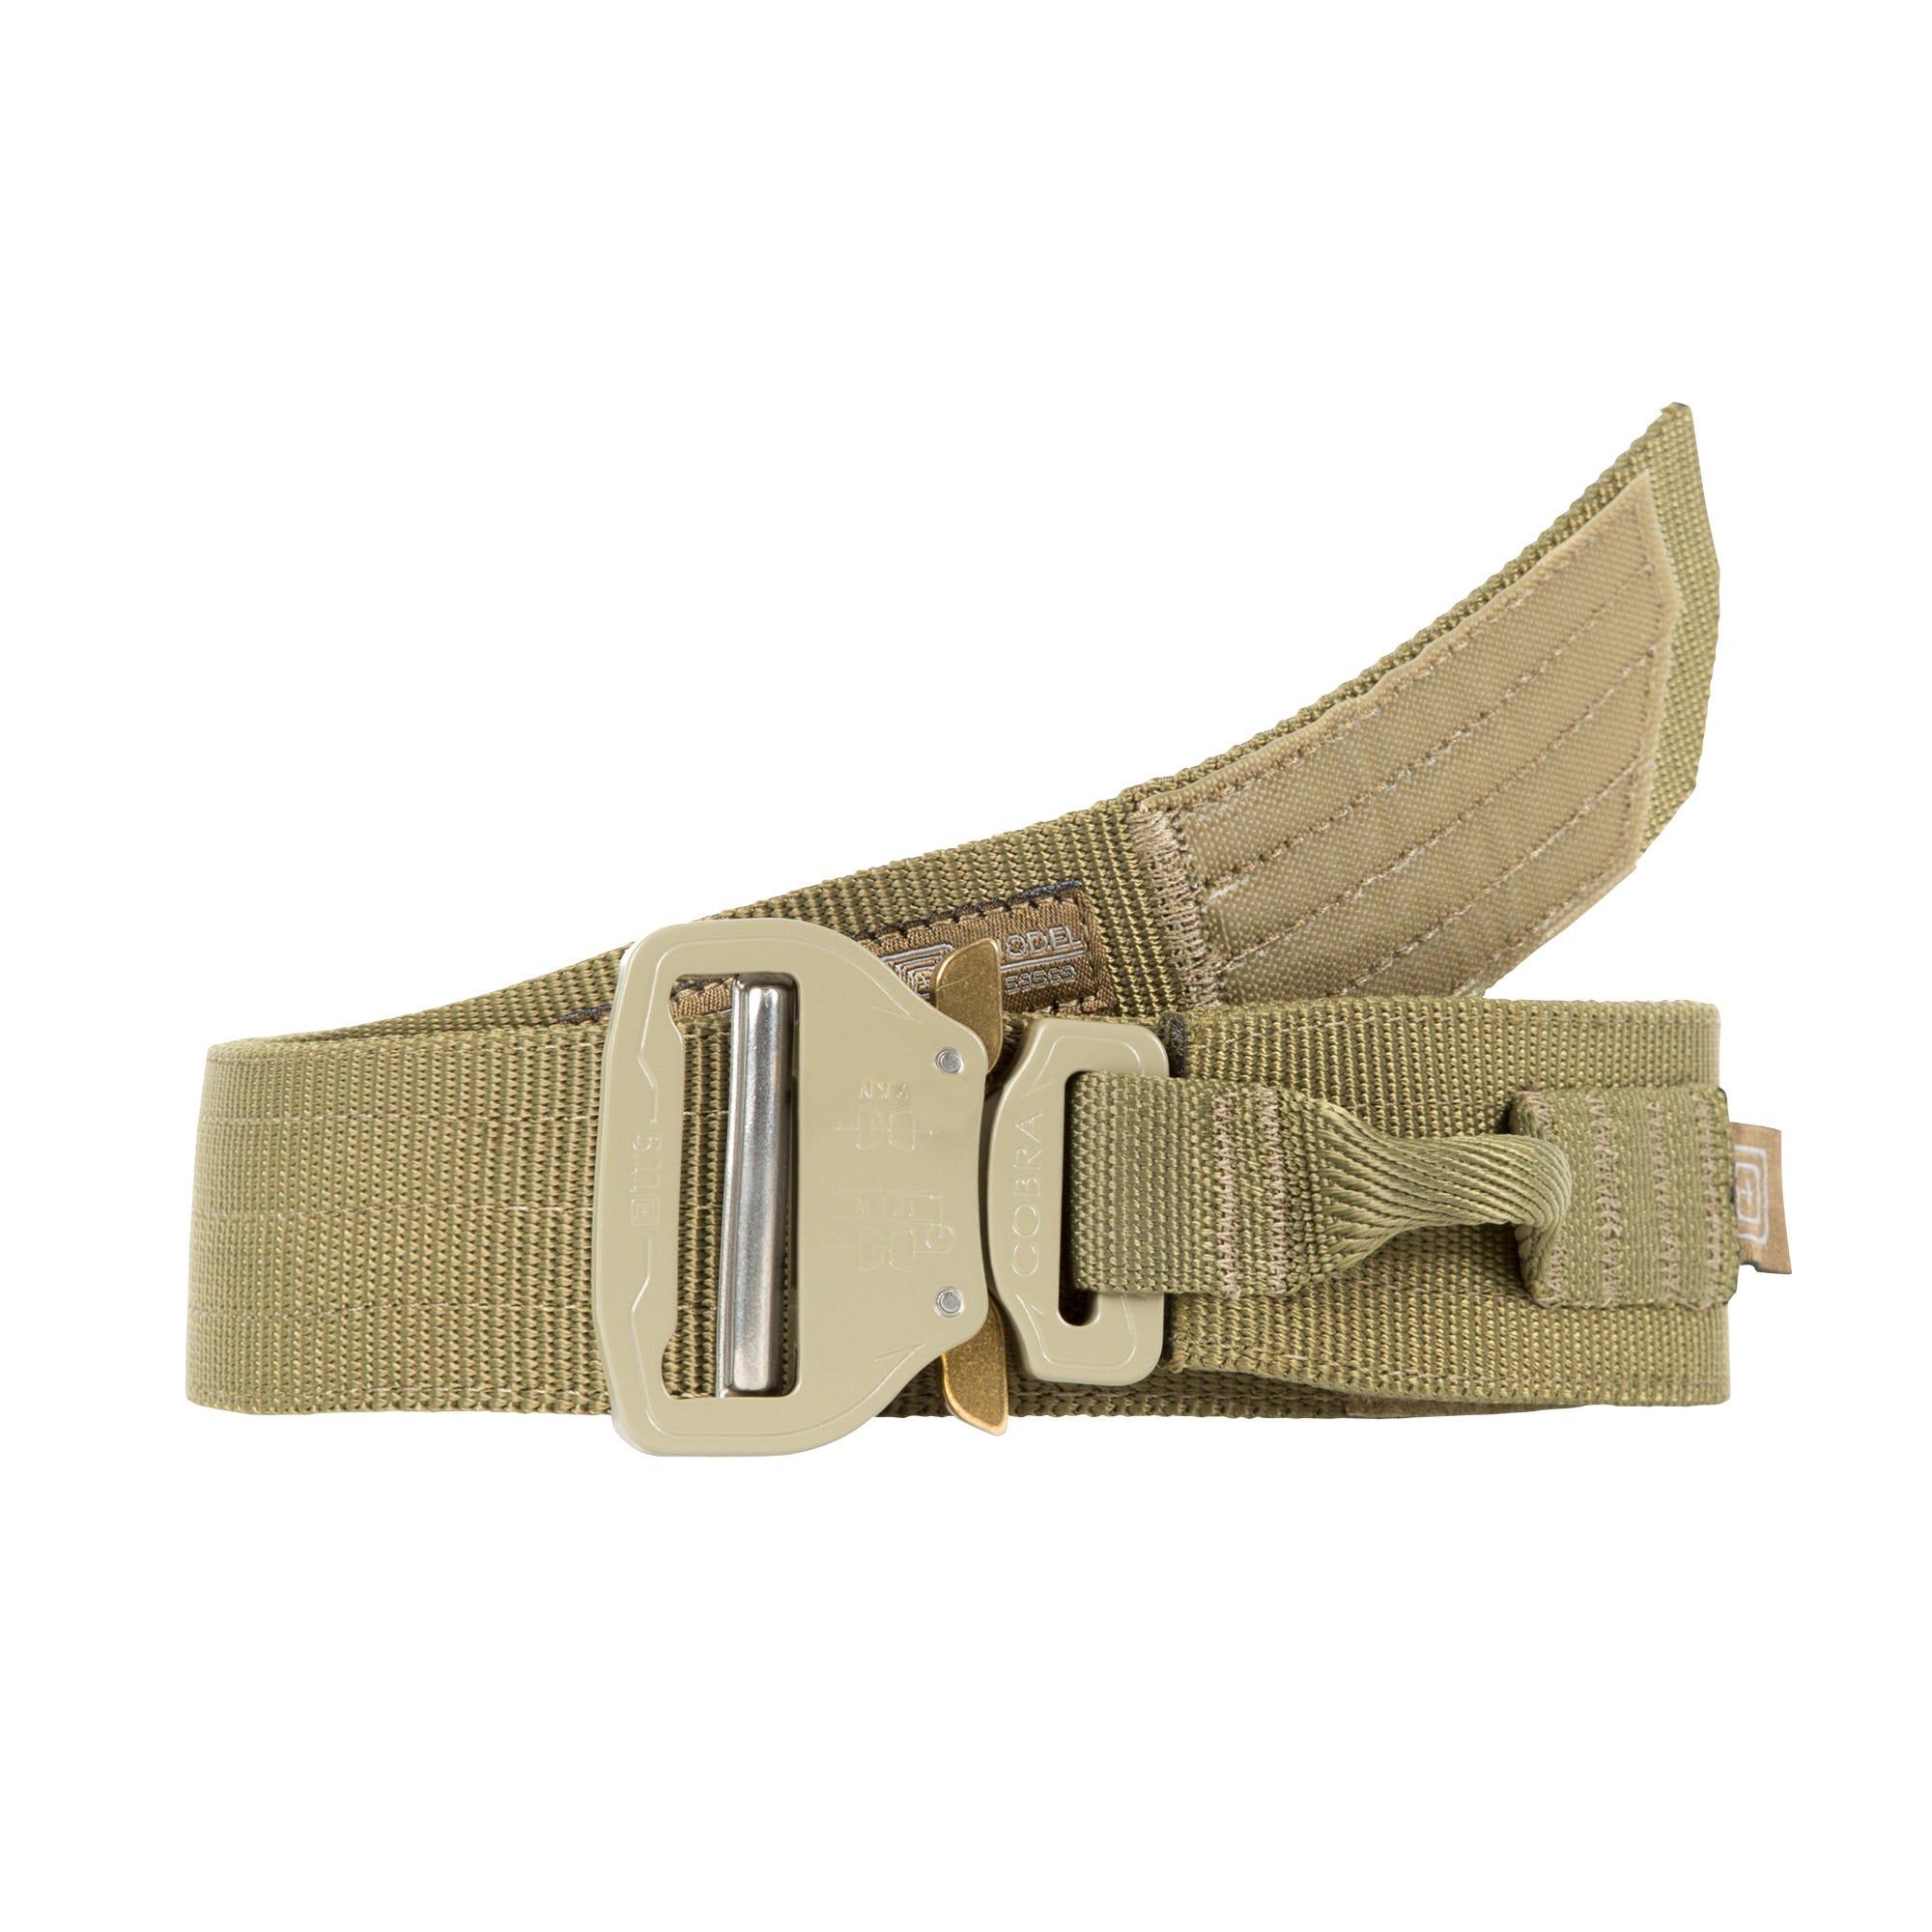 5.11 Tactical Men's Maverick Assaulters Belt (Khaki/Tan)